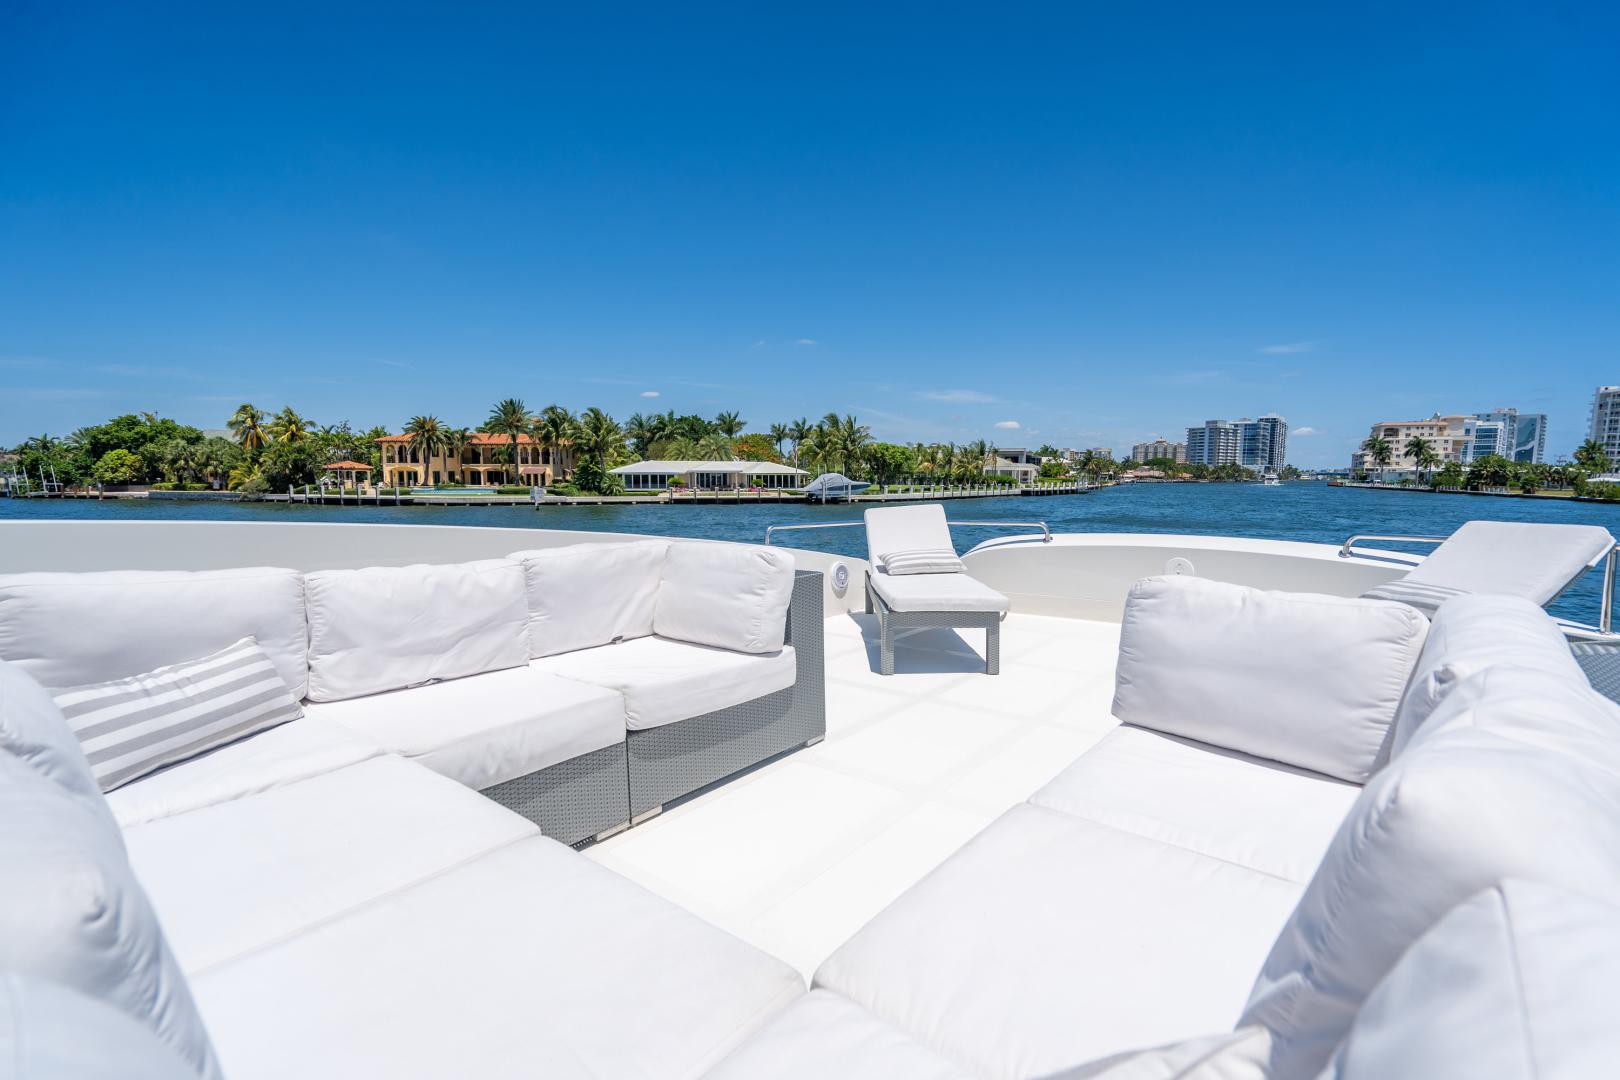 Overblue-58 Power Catamaran 2017-Techuila Ft. Lauderdale-Florida-United States-2017 Overblue 58 Powercat Sun Lounge-1401204   Thumbnail